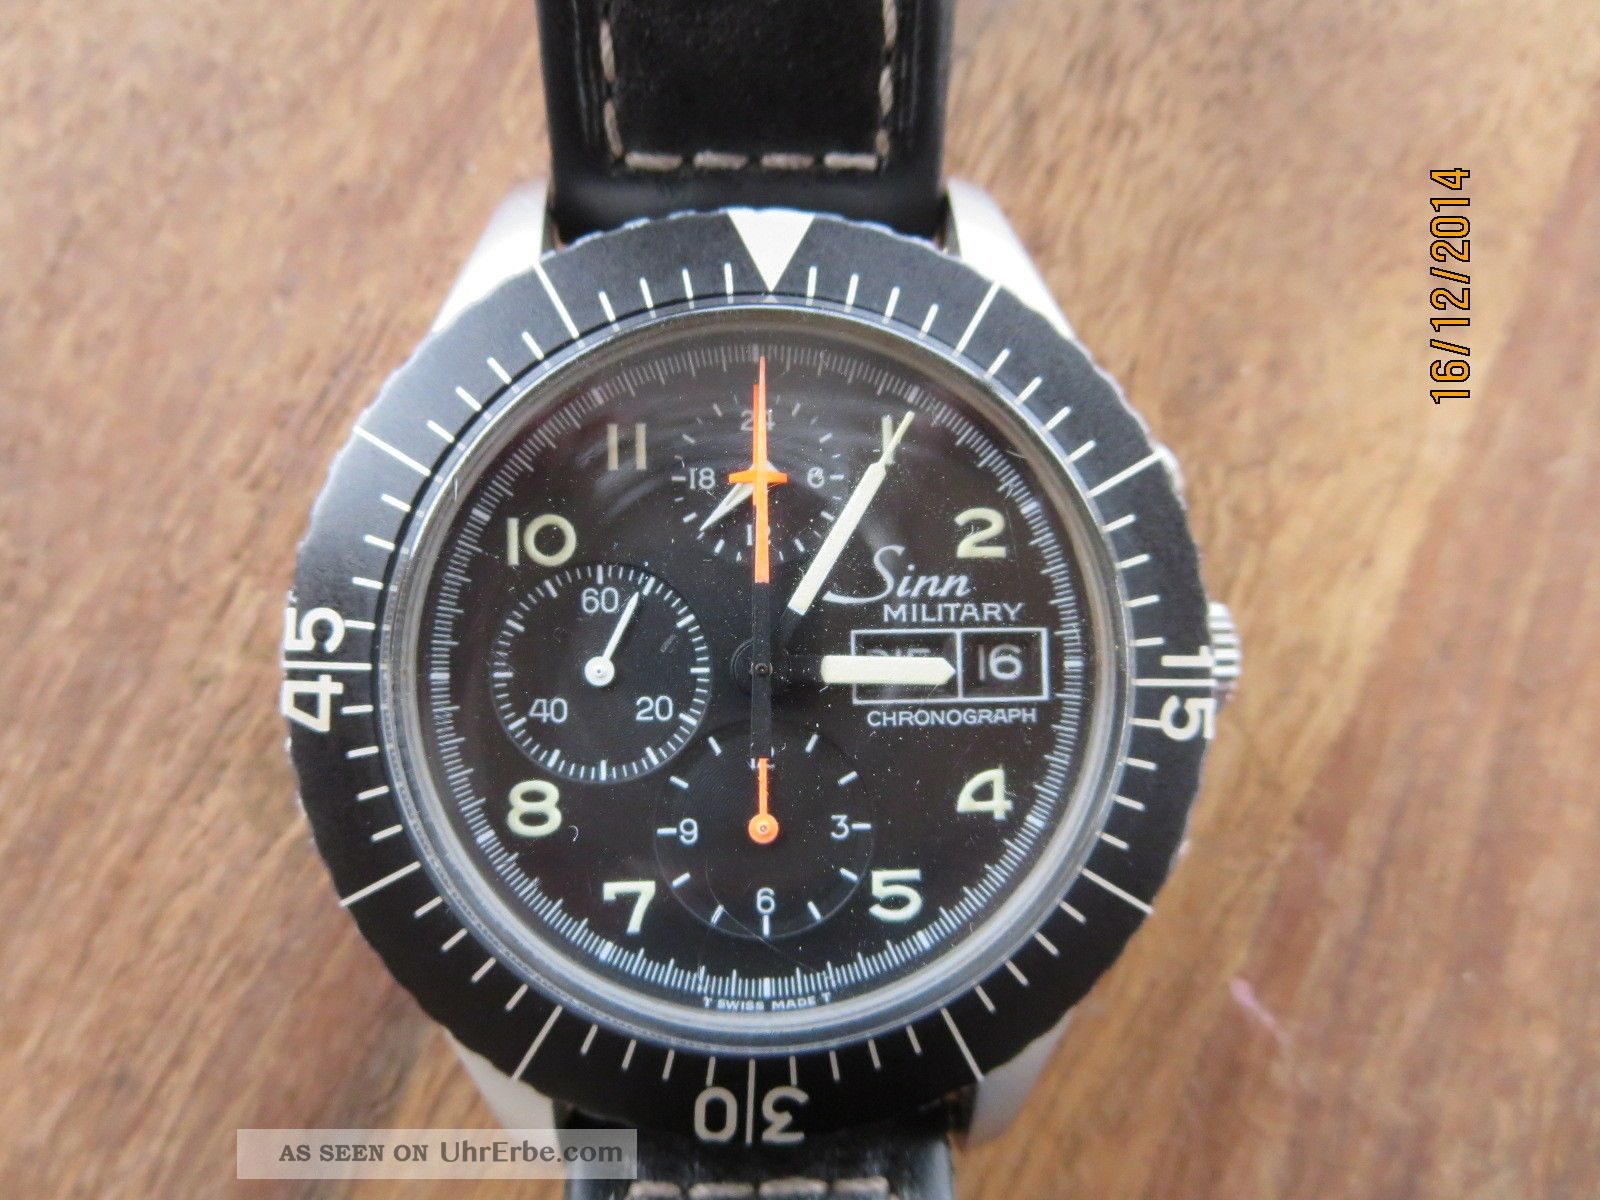 Sinn Military (modell 156) Mit Lemania Werk 5100 Armbanduhren Bild